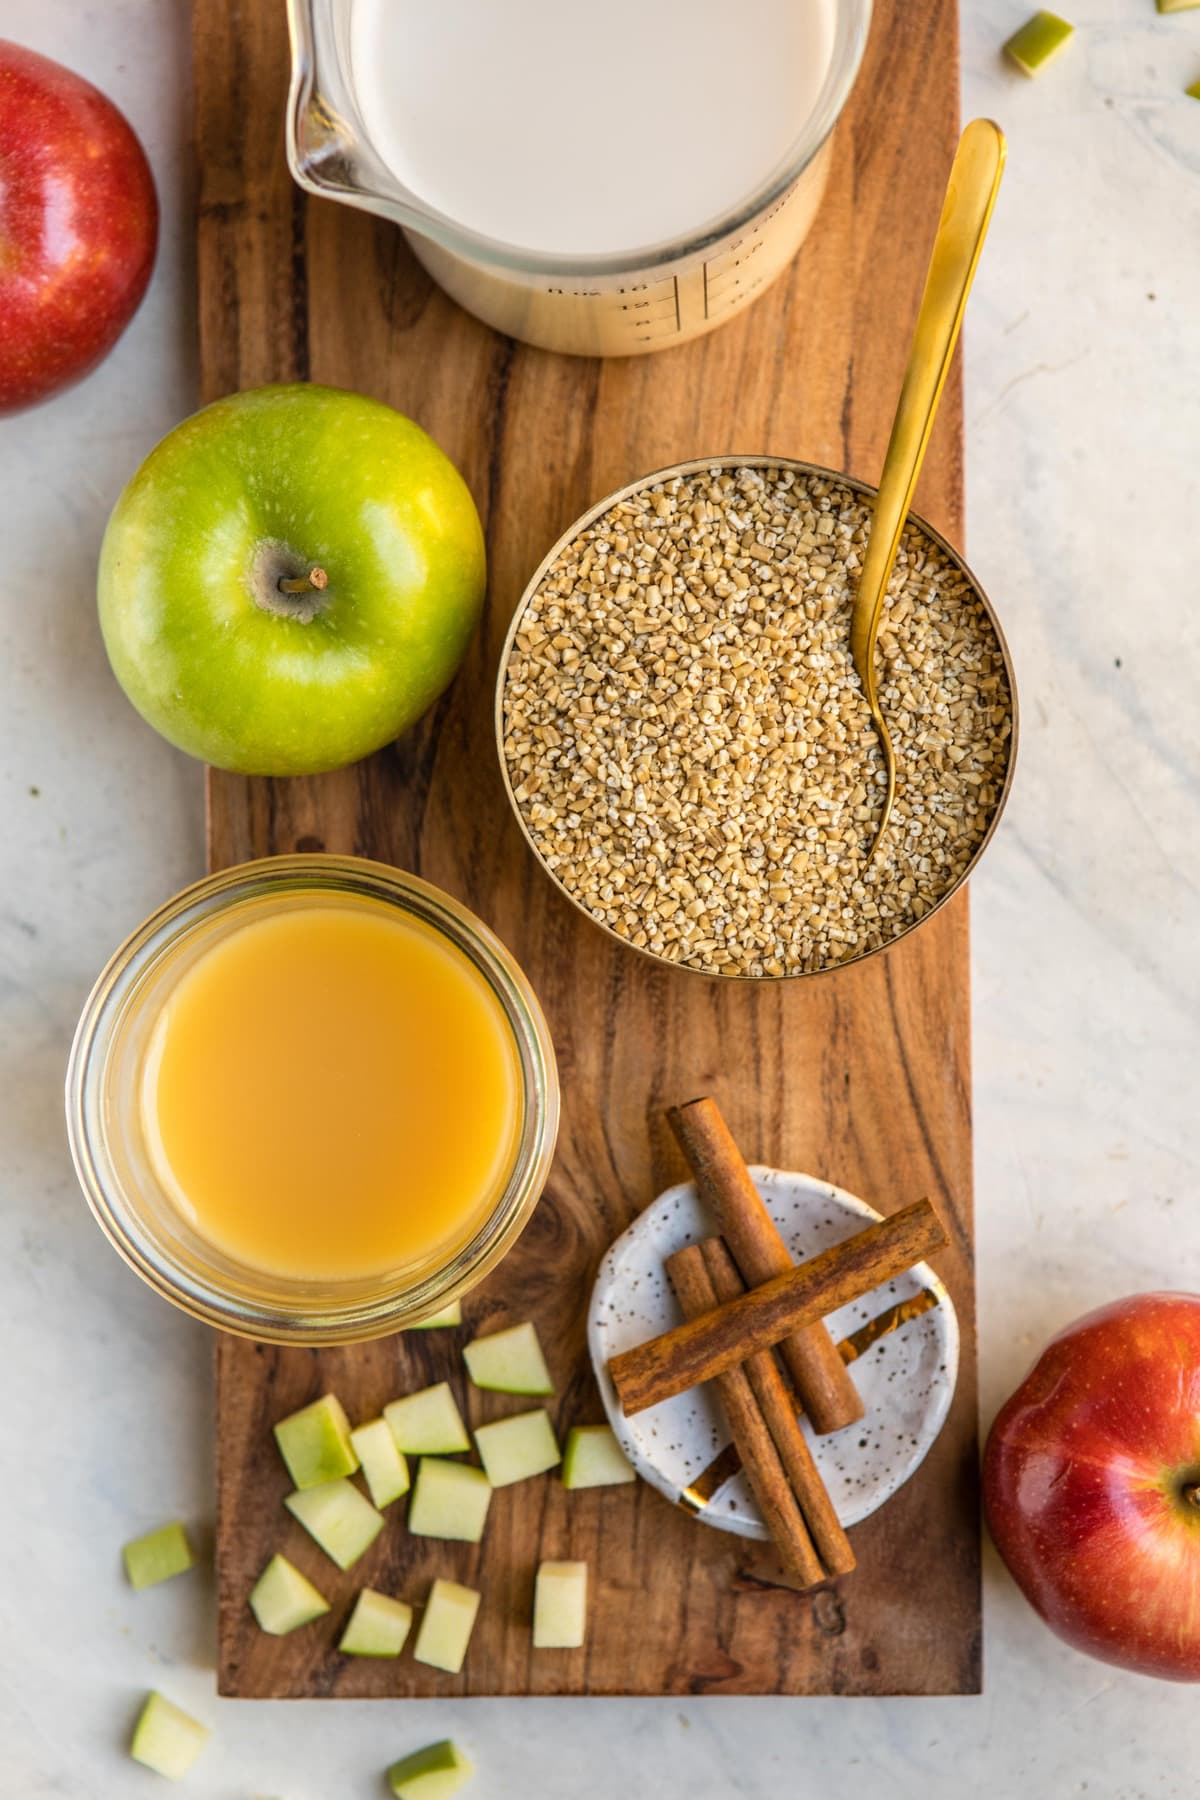 ingredients for apple cinnamon oatmeal on wood cutting board